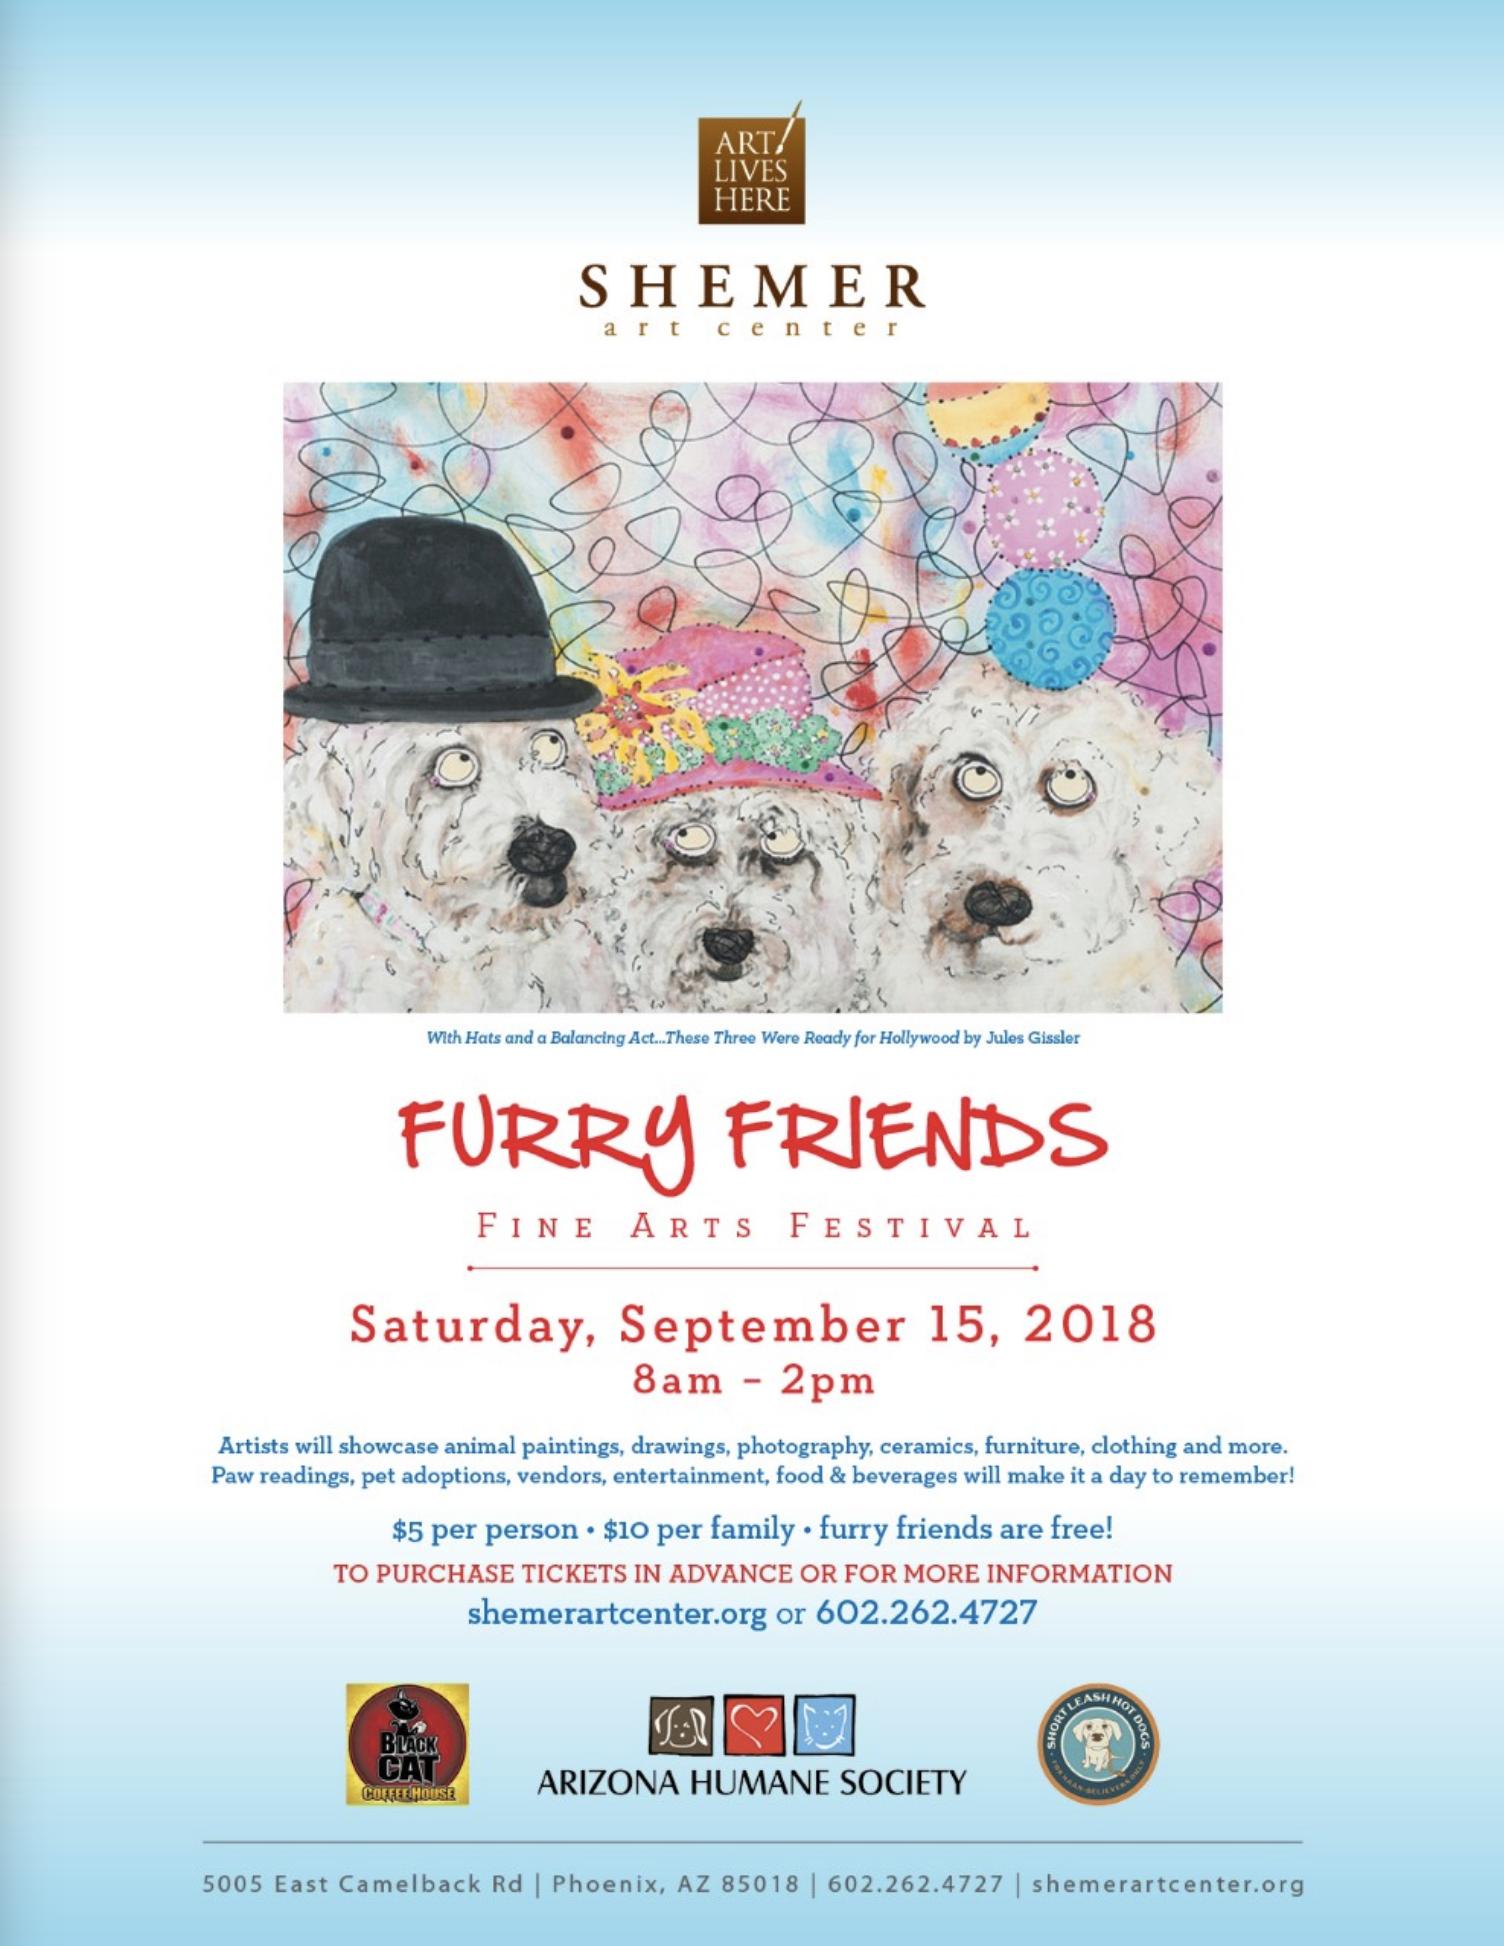 Shemer Art Center Phoenix Arizona